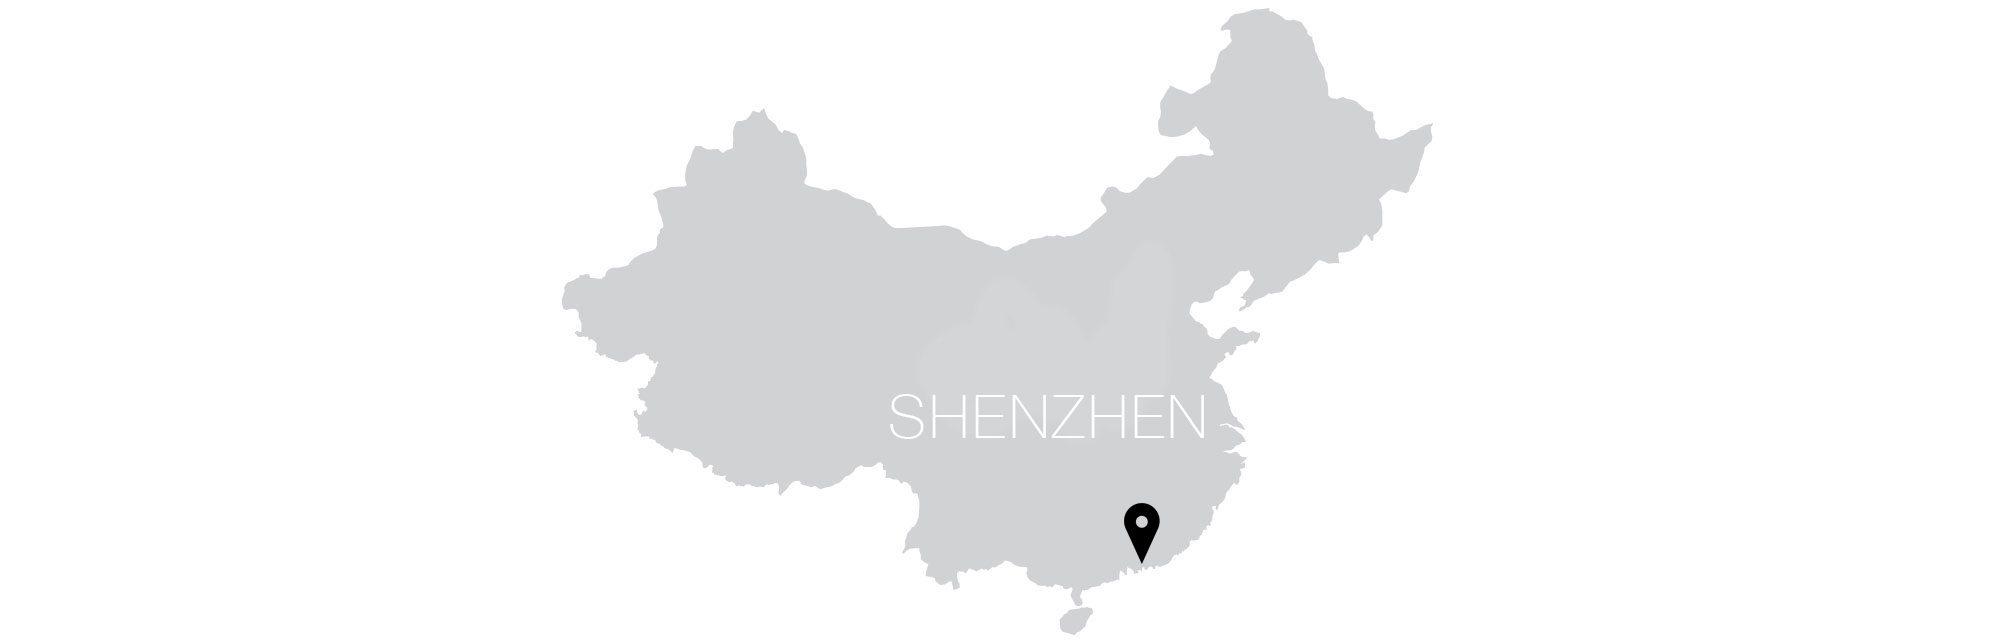 Shenzhen Map Text